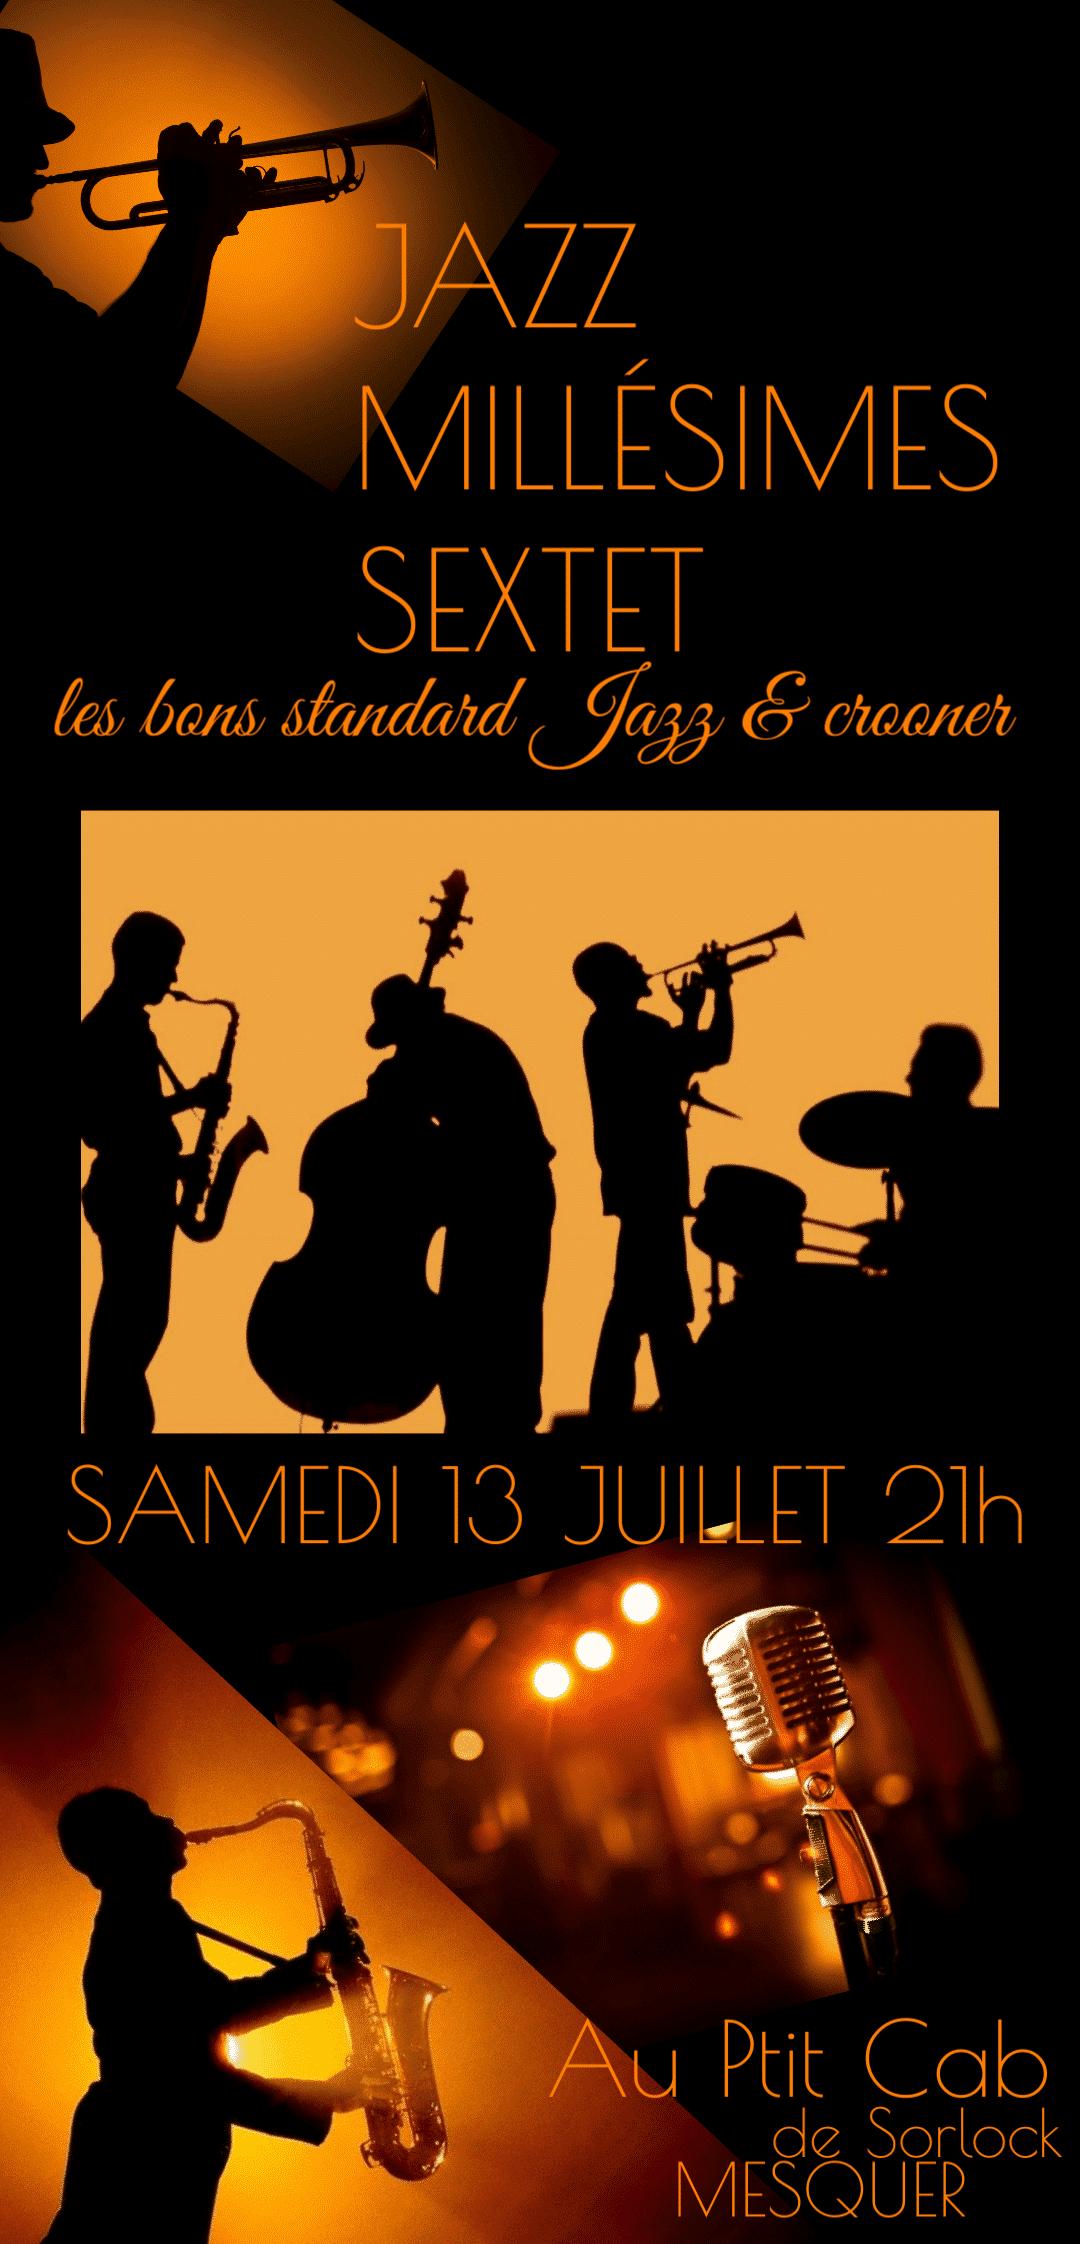 Concert Jazz Millésimes Sextet le 13 Juillet